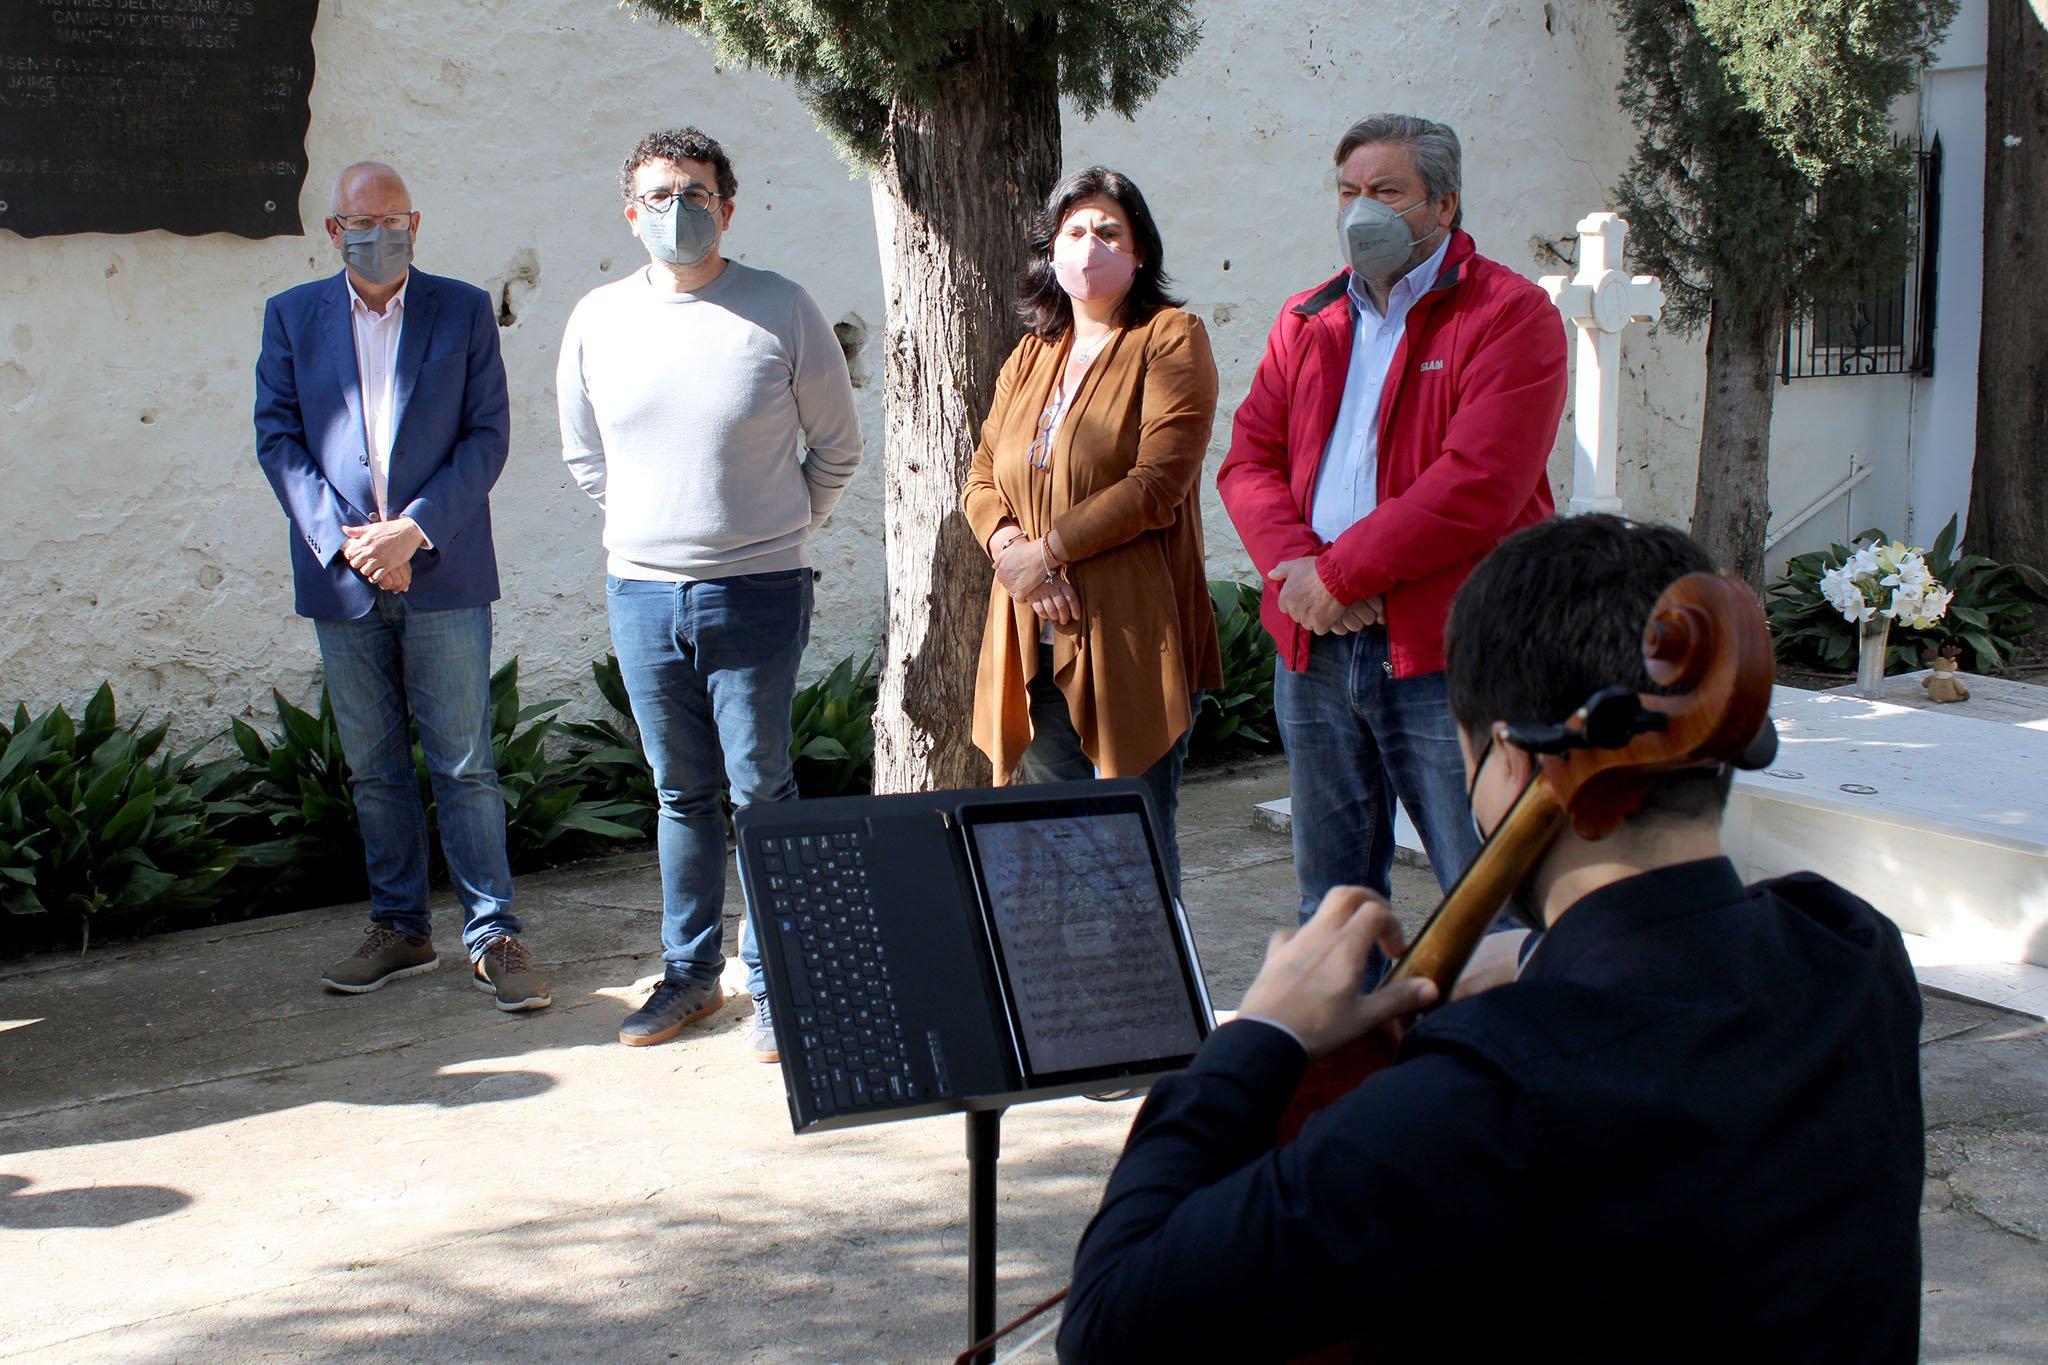 Vicent Grimalt junto a Raúl García de la Reina, concejal de cultura, Rafa Carrió, portavoz de Compromís, y María Mut, portavoz del PP, en el homenaje